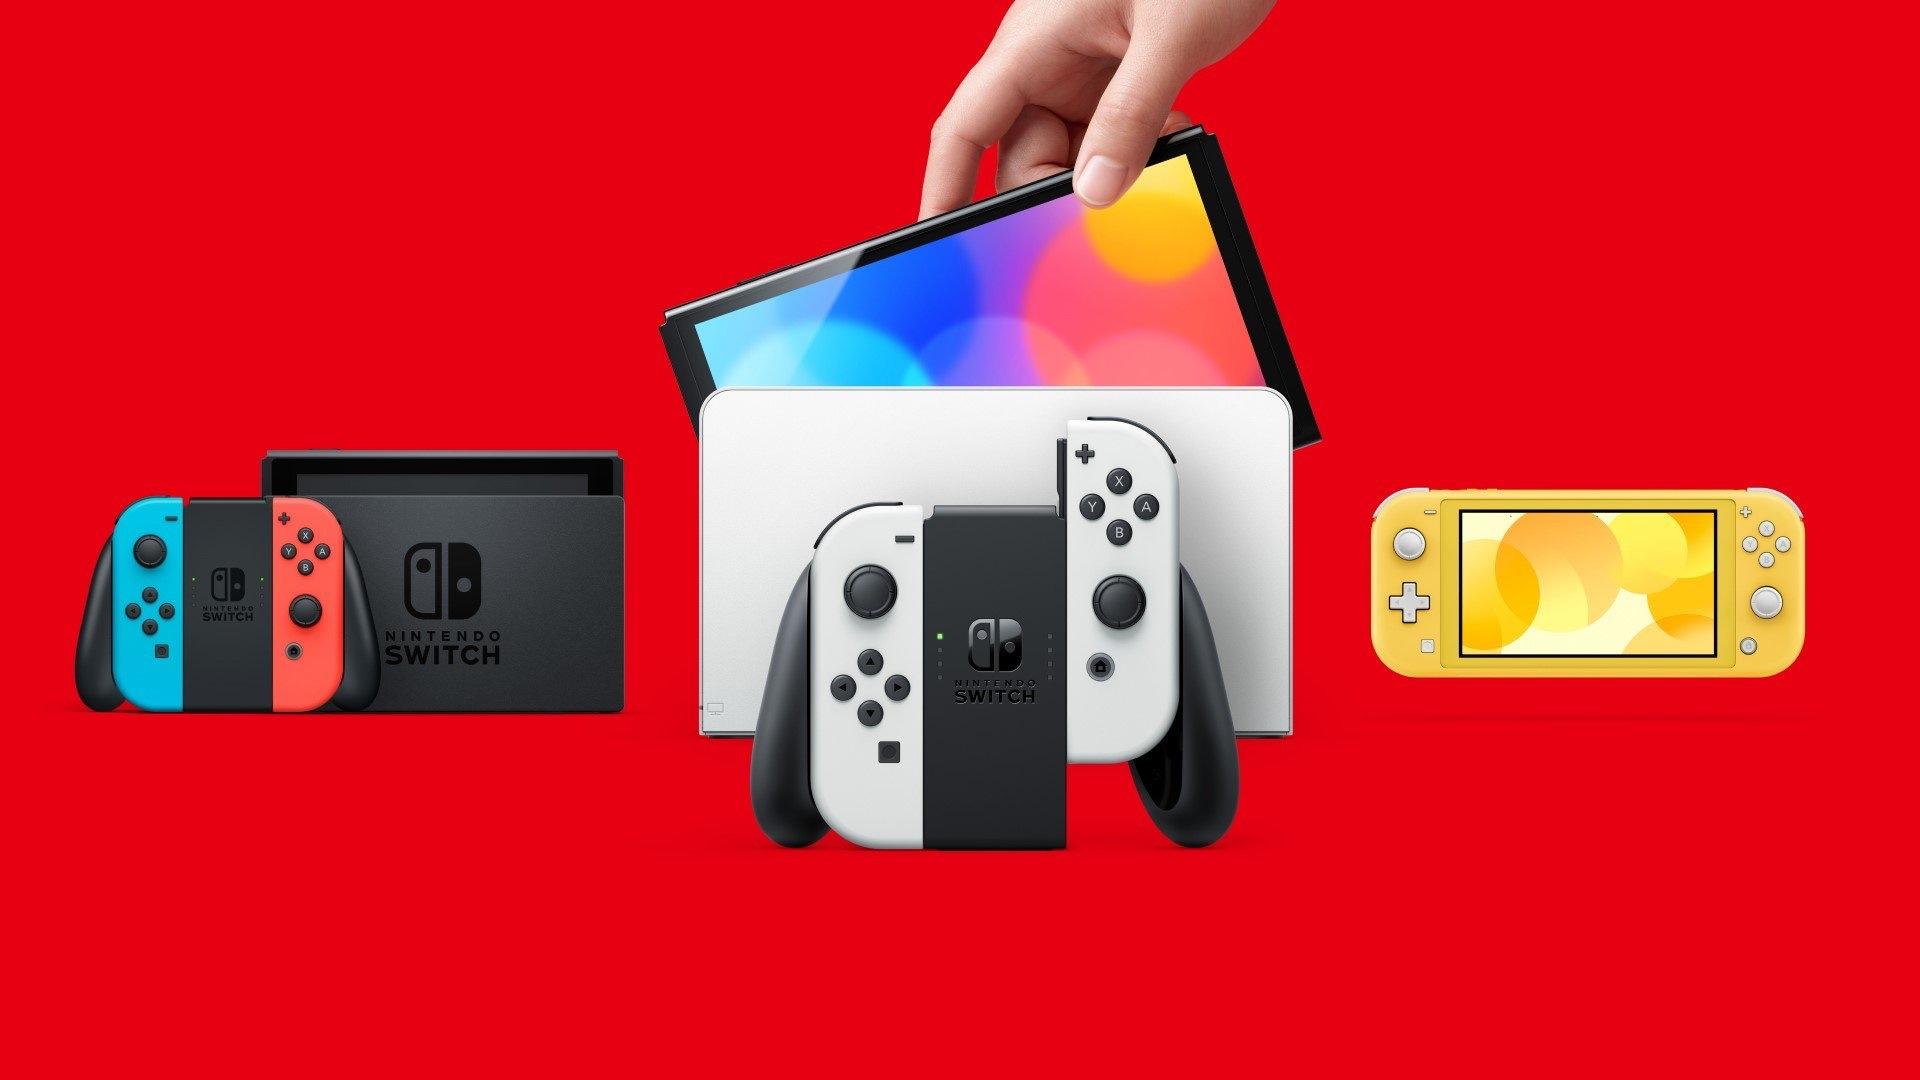 De izquierda a derecha: Nintendo Switch, Nintendo Switch OLED Model, Nintendo Switch Lite.